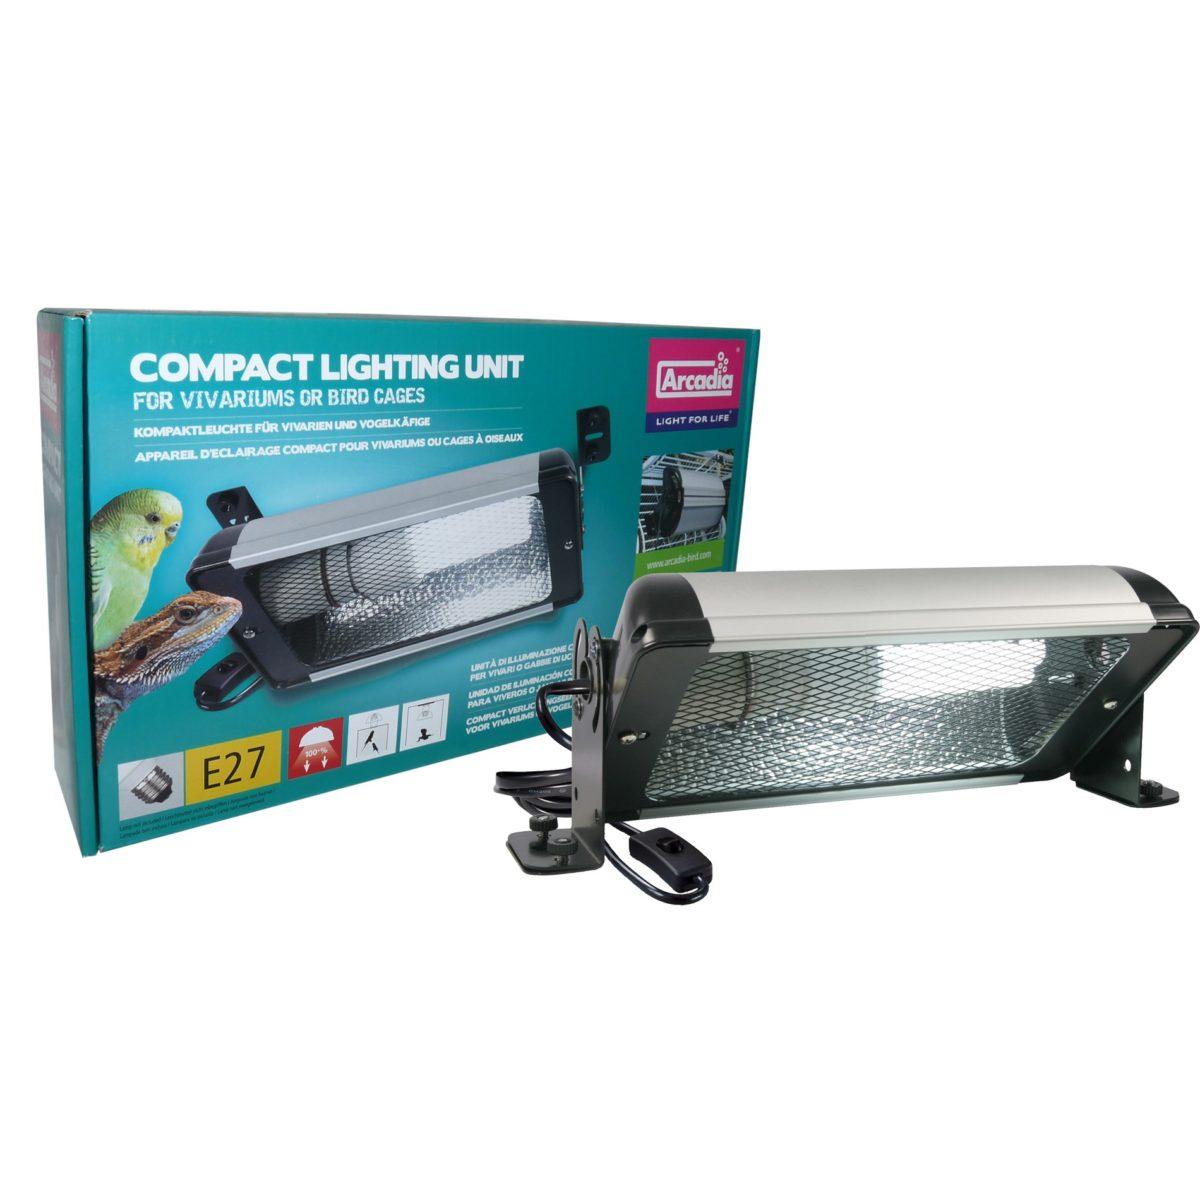 Светильник Arcadia Compact Lighting Unit